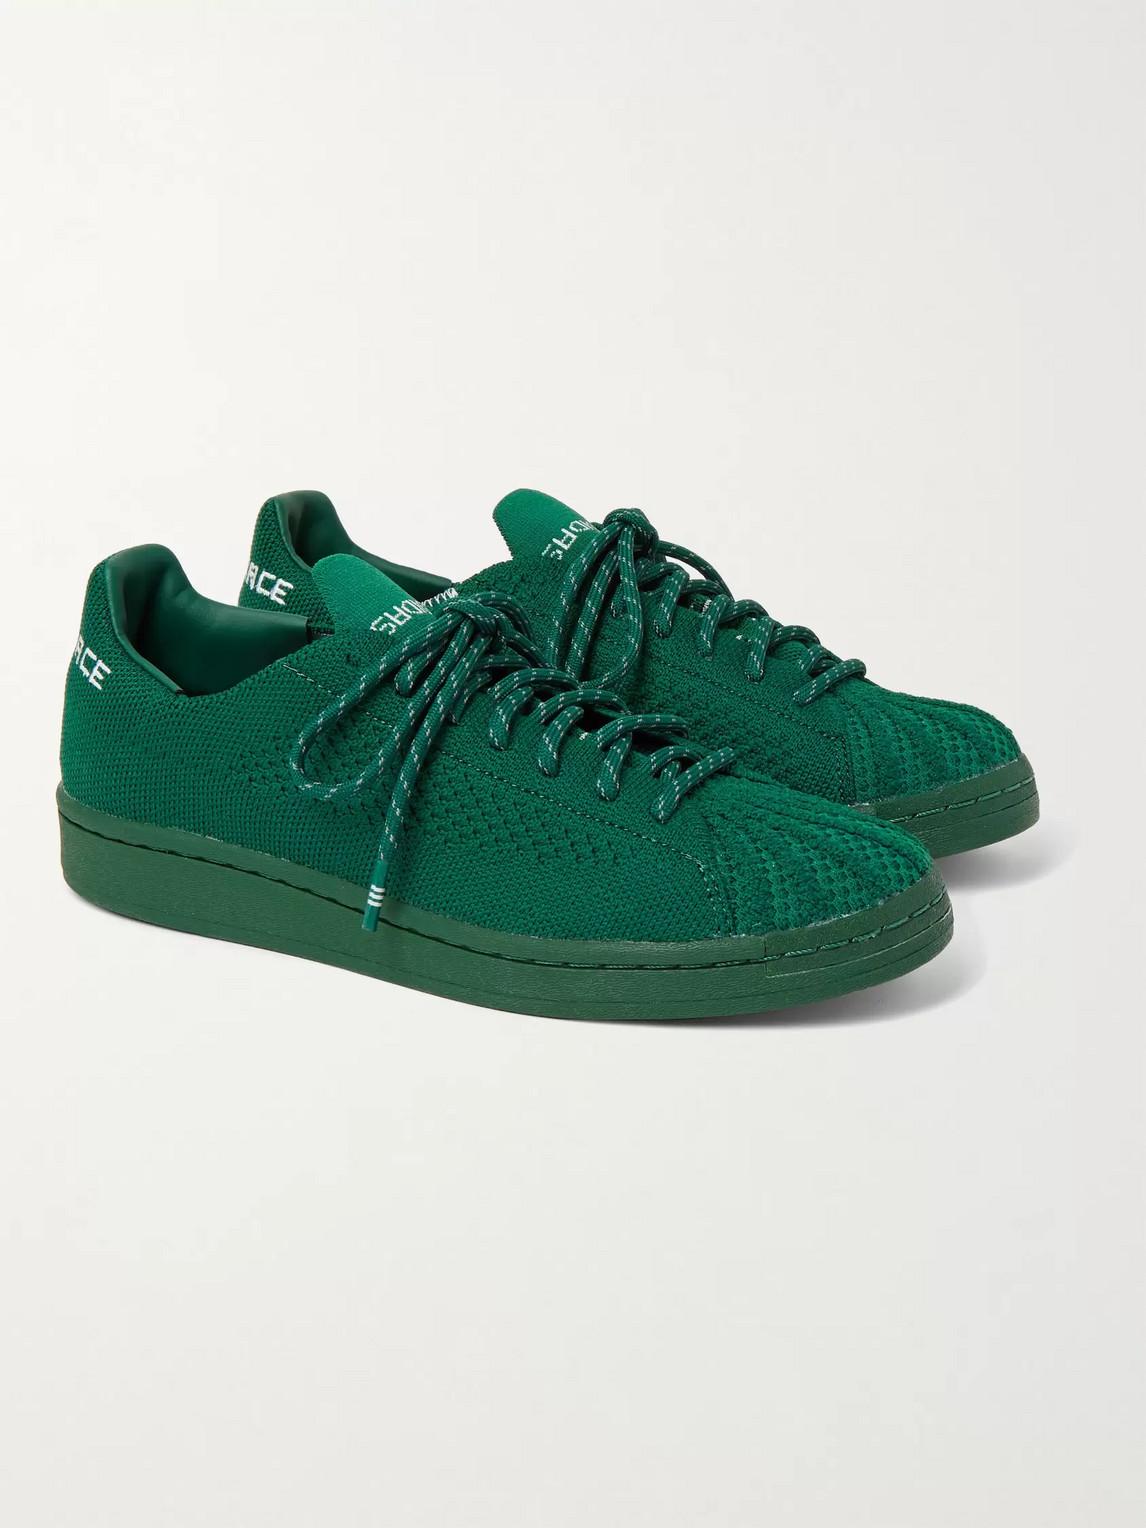 Adidas Originals Sneakers PHARRELL WILLIAMS SUPERSTAR EMBROIDERED PRIMEKNIT SNEAKERS